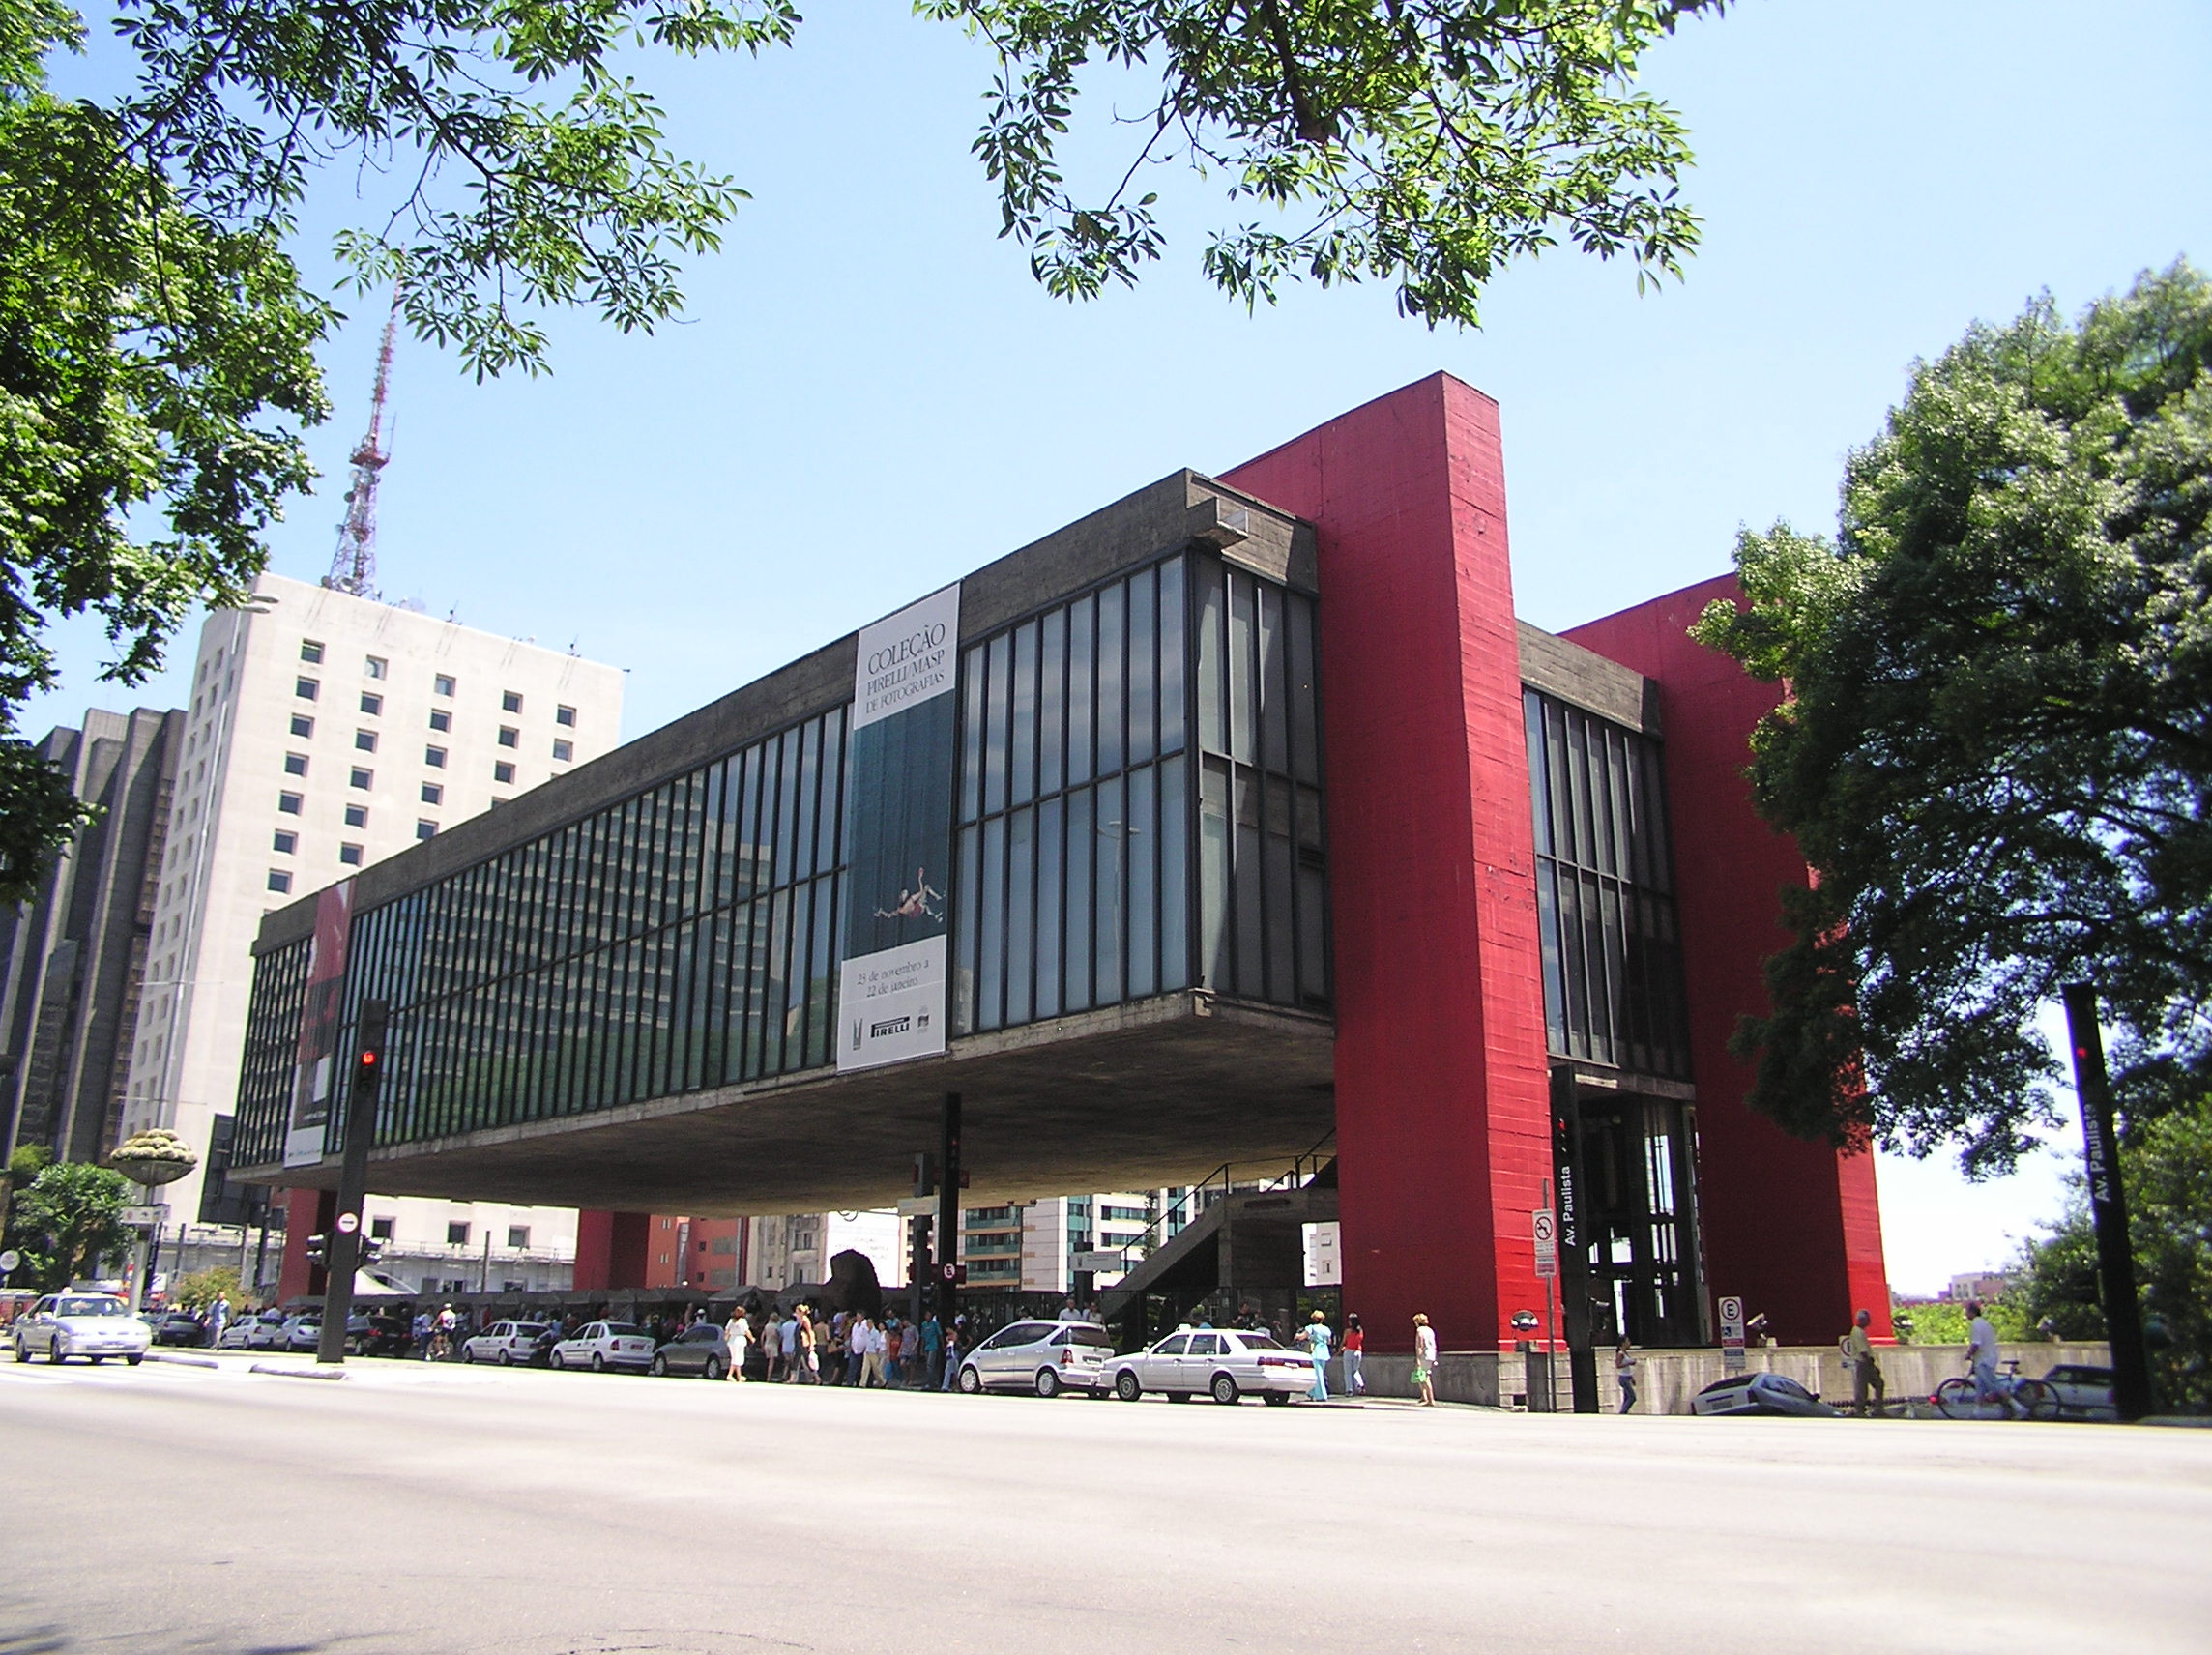 http://upload.wikimedia.org/wikipedia/commons/a/ad/Museu_de_Arte_de_Sao_Paulo_1_Brasil.jpg